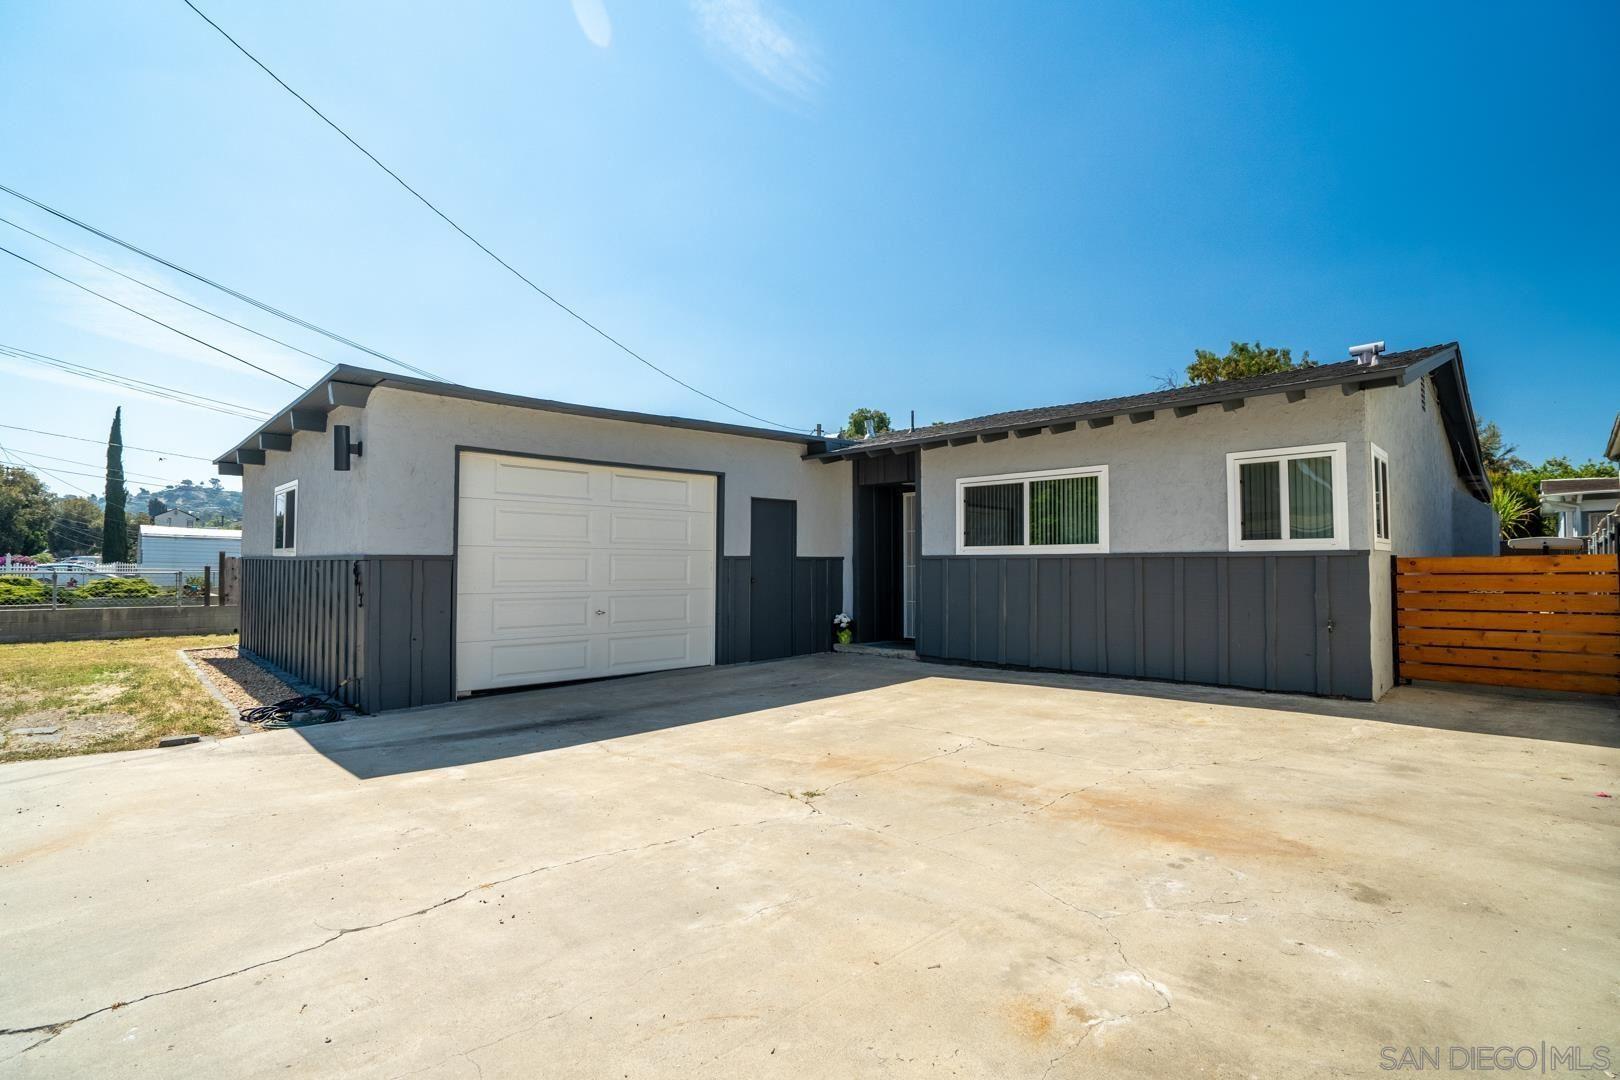 Photo of 8813 Lamar Street, Spring Valley, CA 91977 (MLS # 210015611)